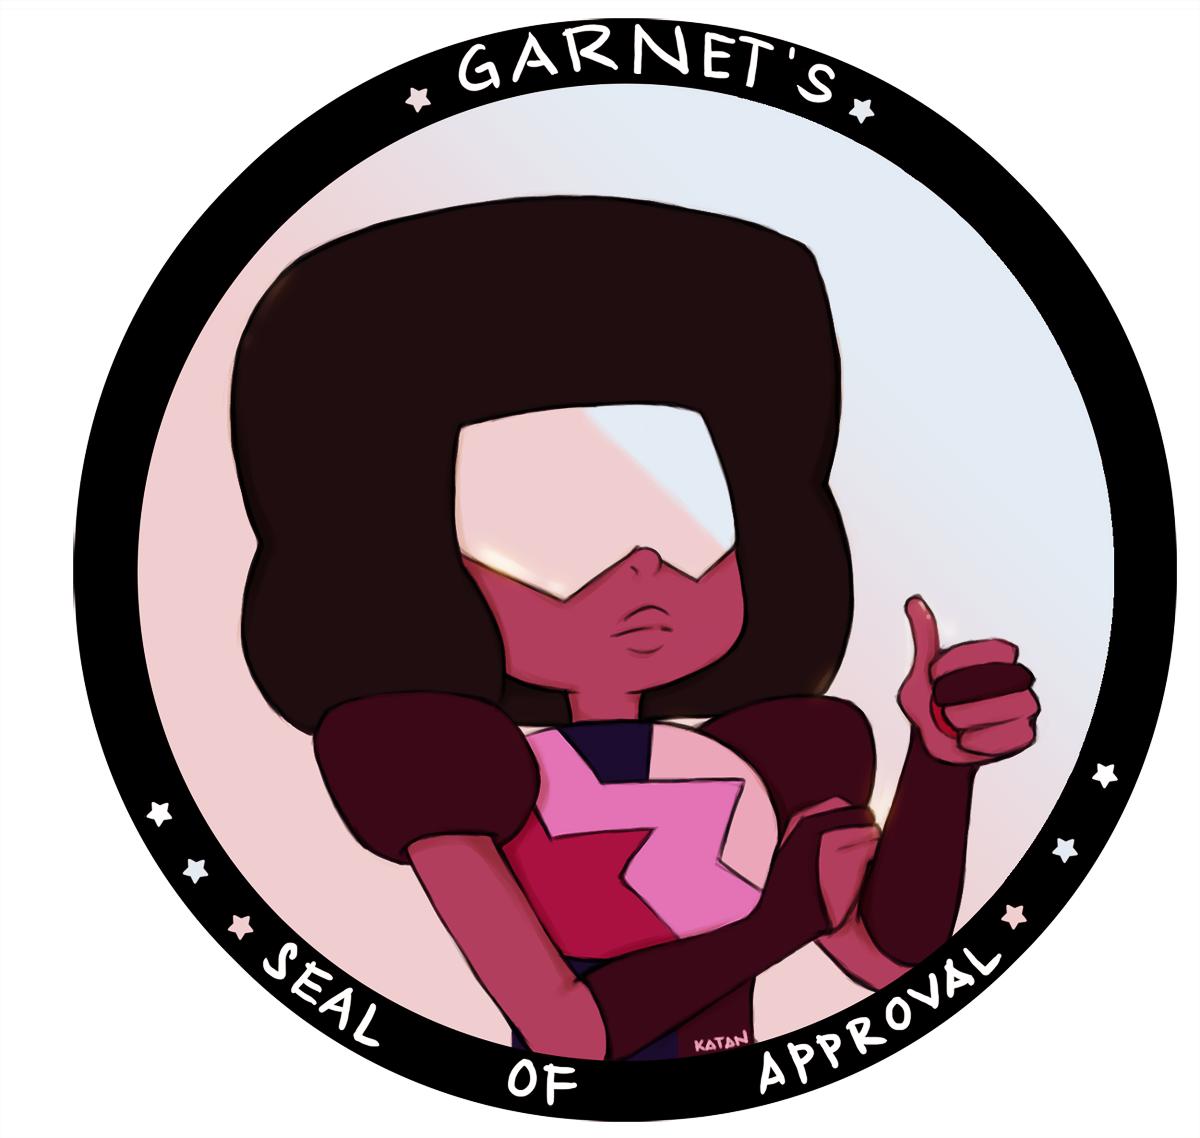 Garnet's Seal of Approval by Katantoon